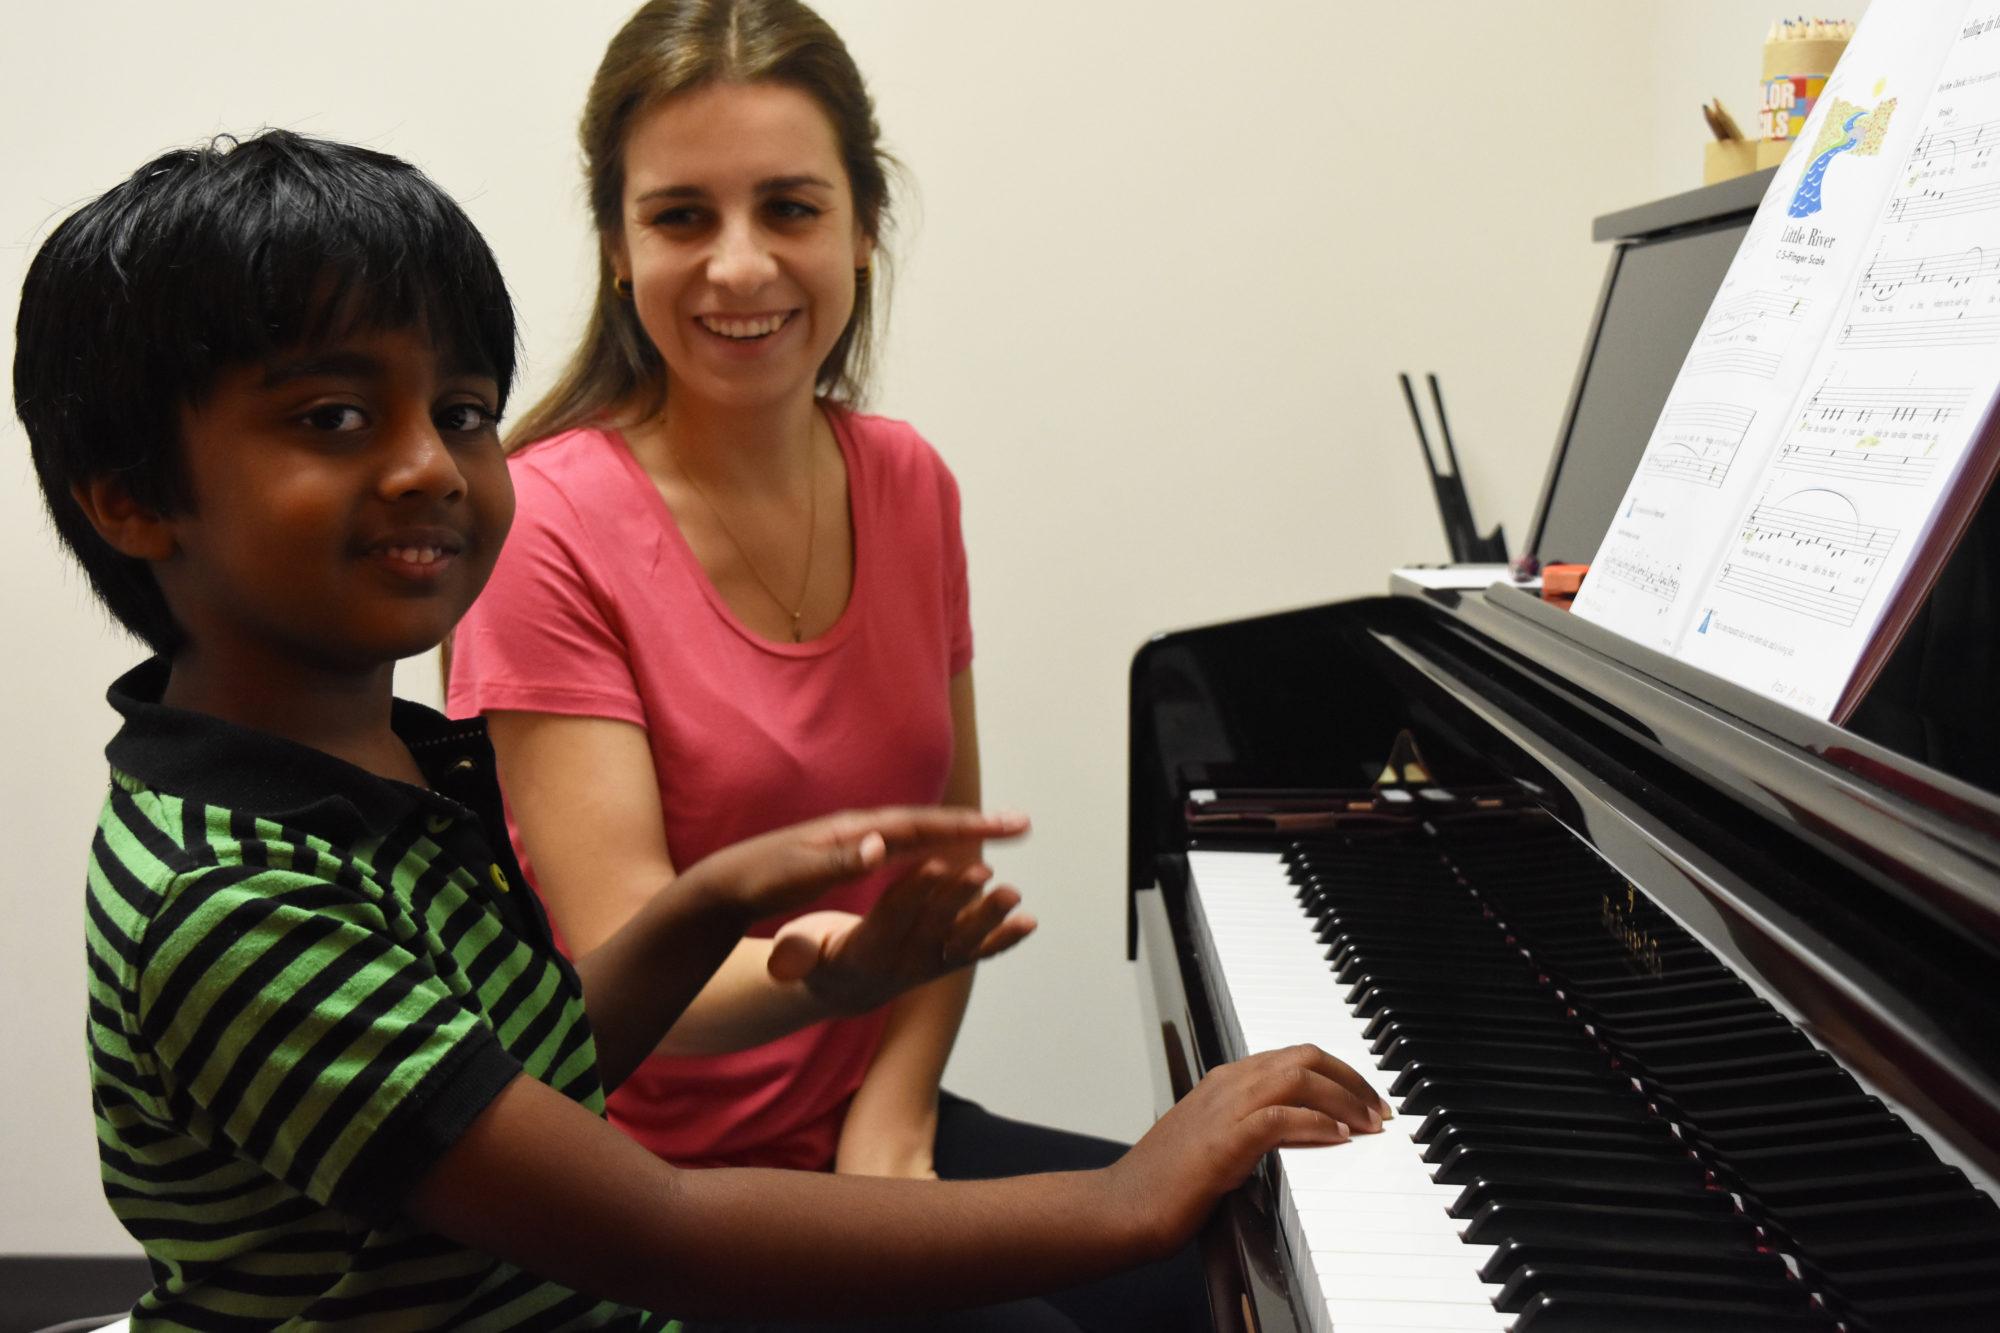 Private Music Lessons | Vivaldi Music Academy